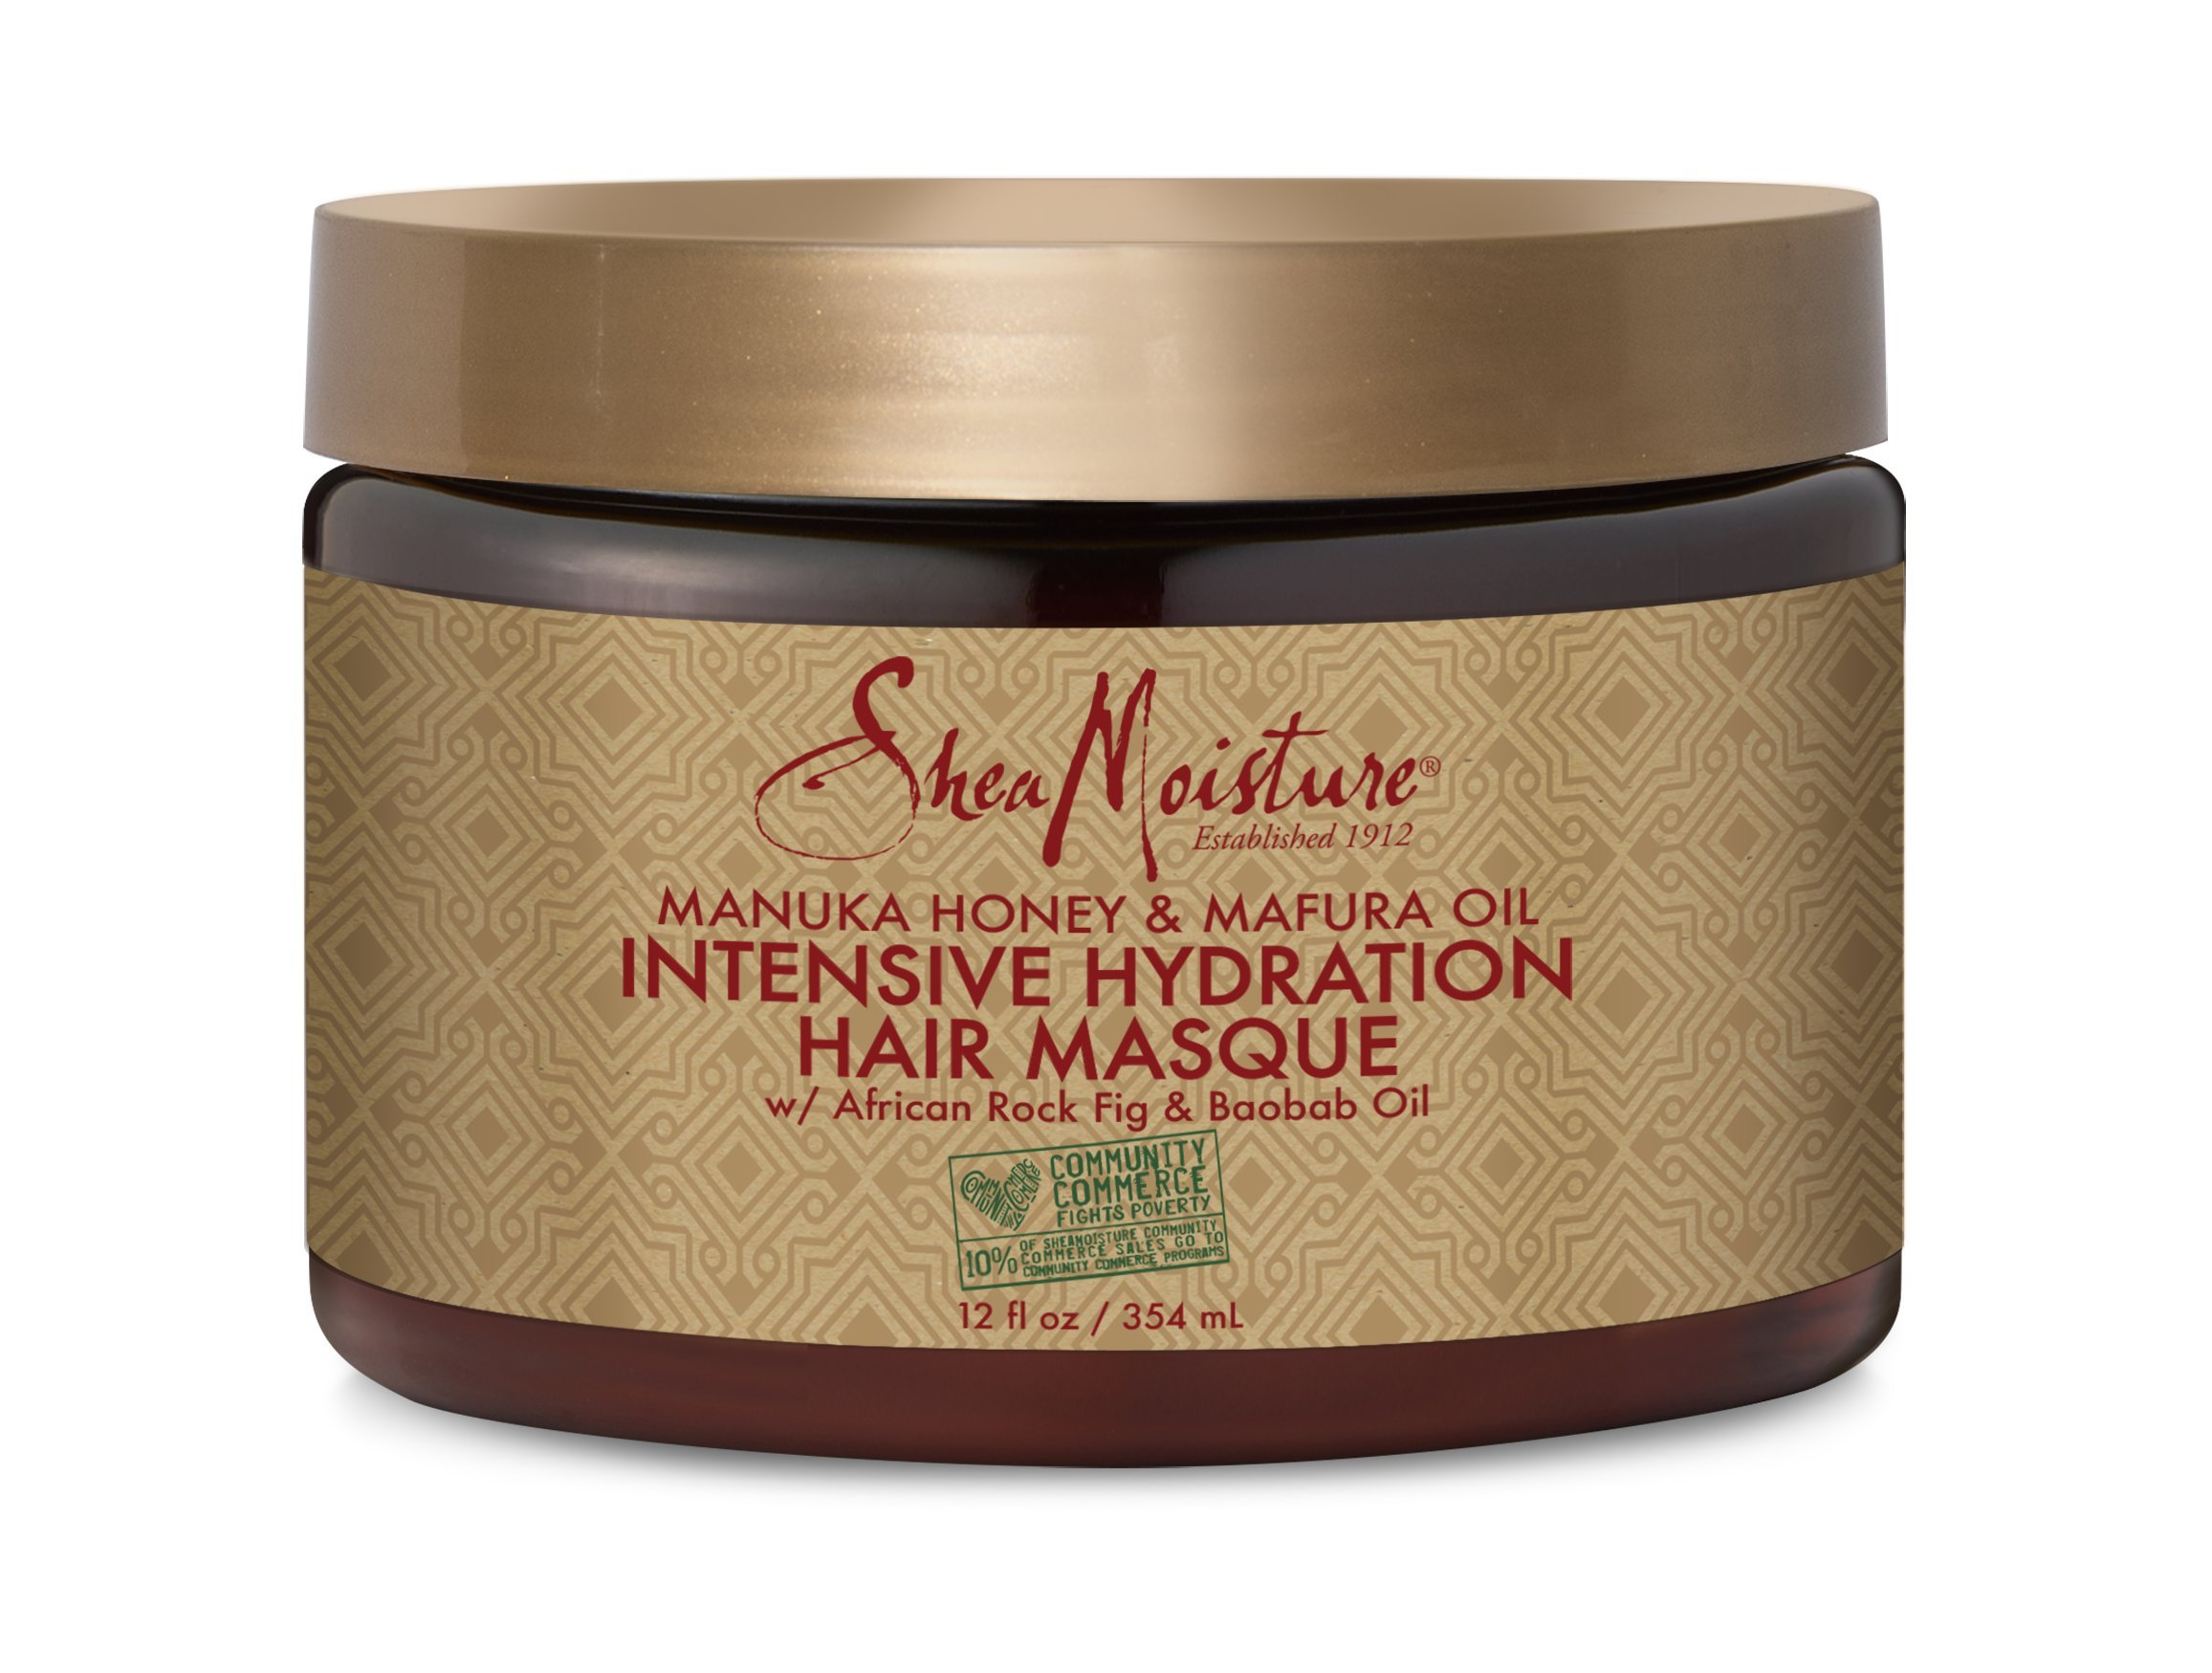 Sheamoisture Manuka Honey &Mafura Oil Intensive Hydration Treatment Masque, 12 Oz by SHEA MOISTURE